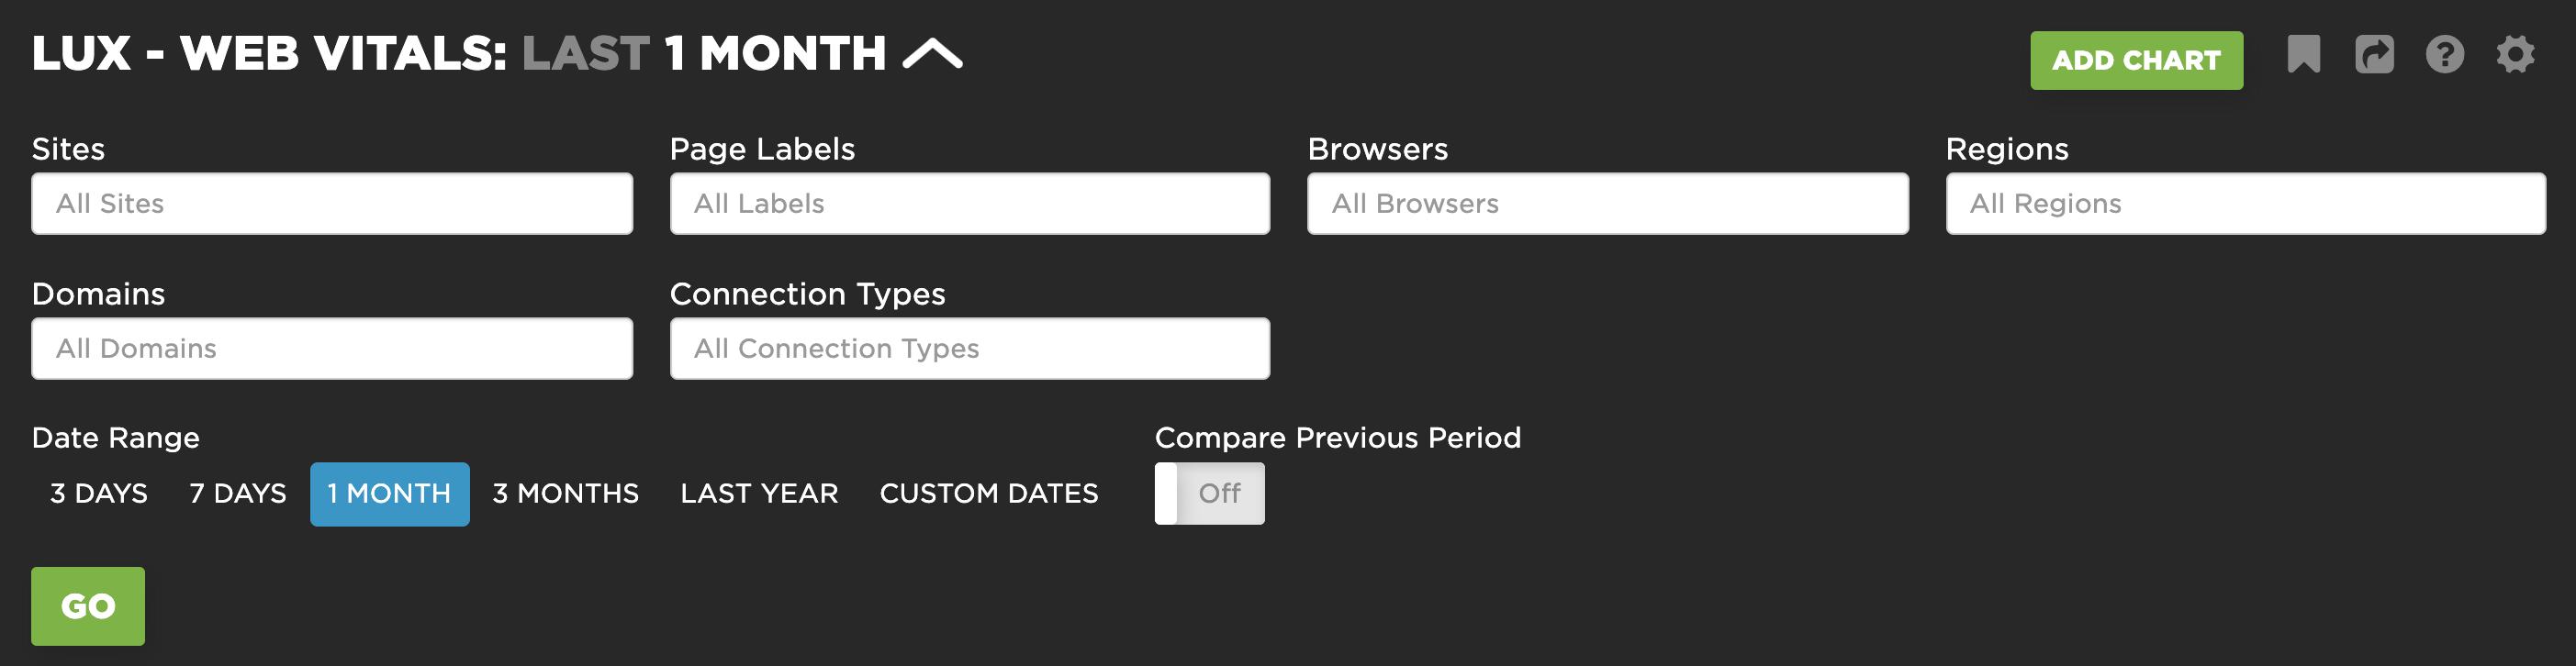 Filtering the Web Vitals Dashboard